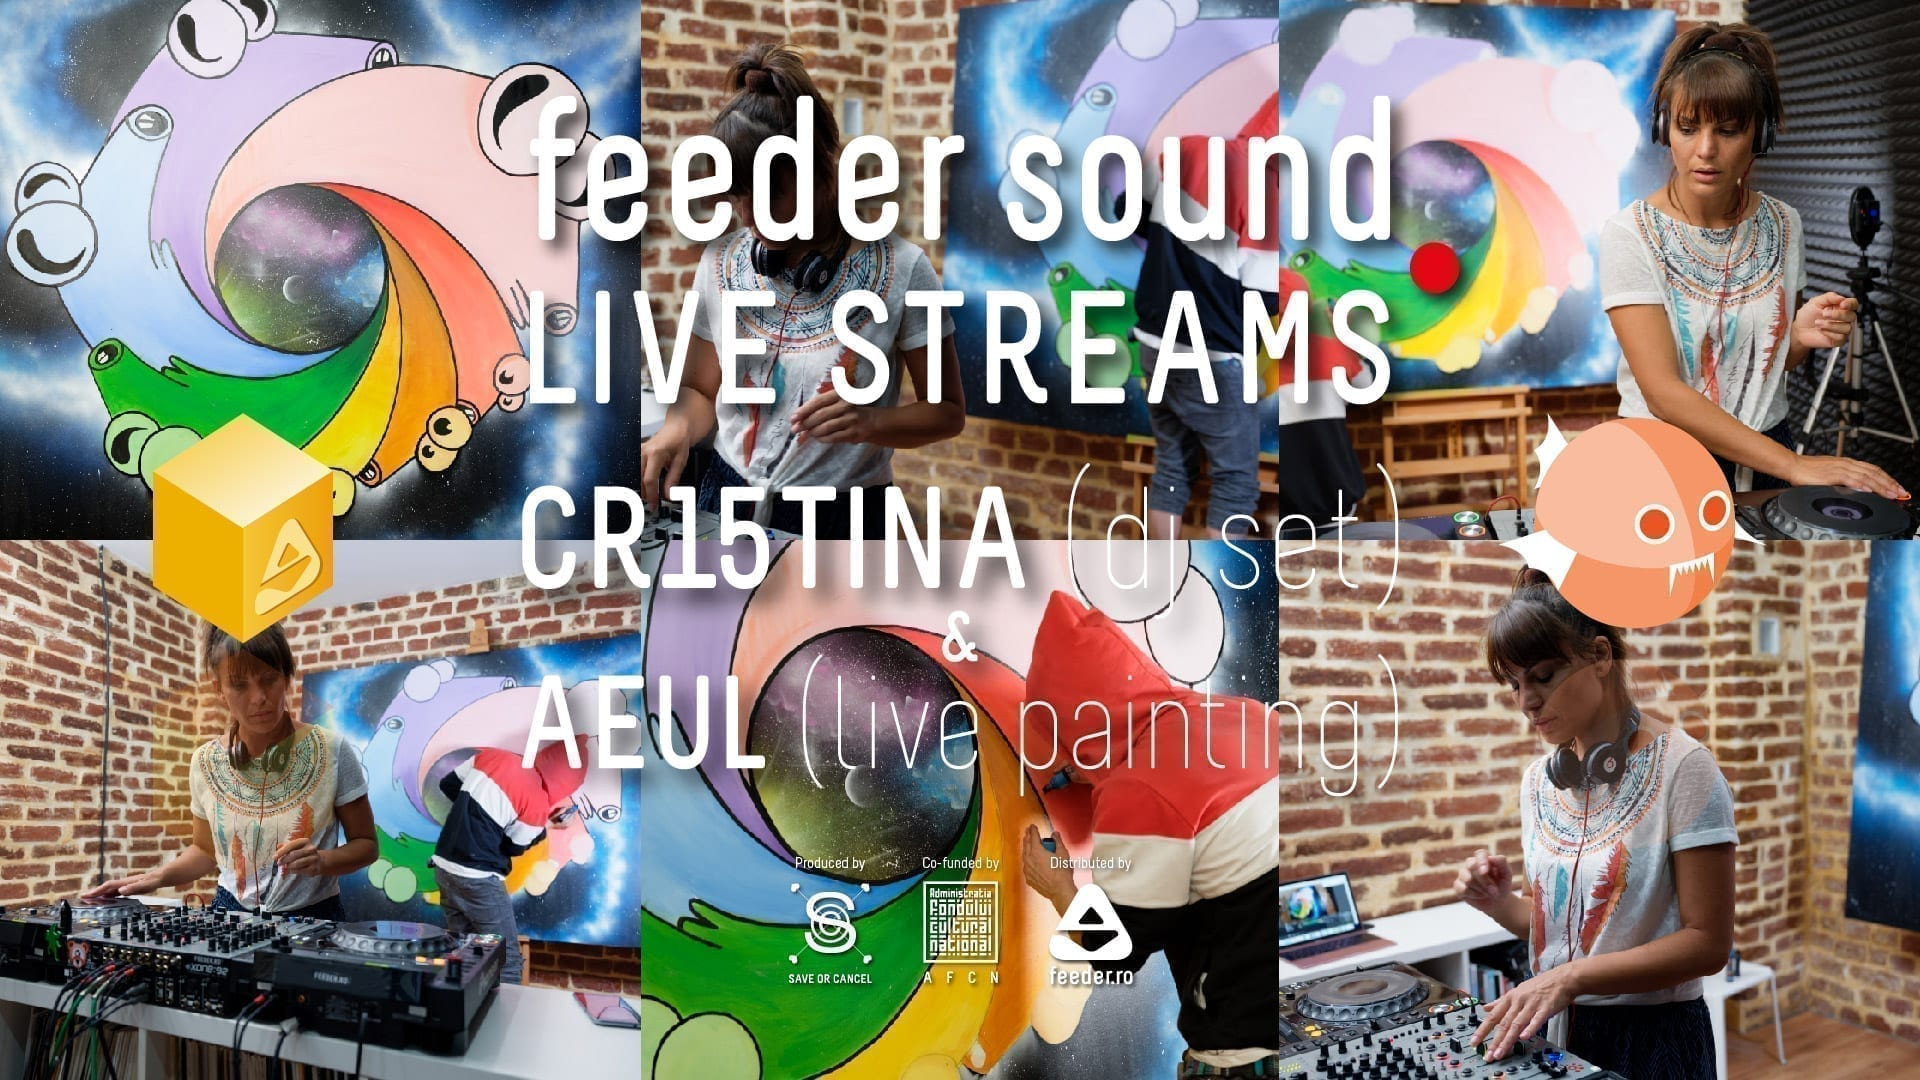 feeder sound LIVE STREAMS with CR15TINA (dj set) & AEUL (live painting)